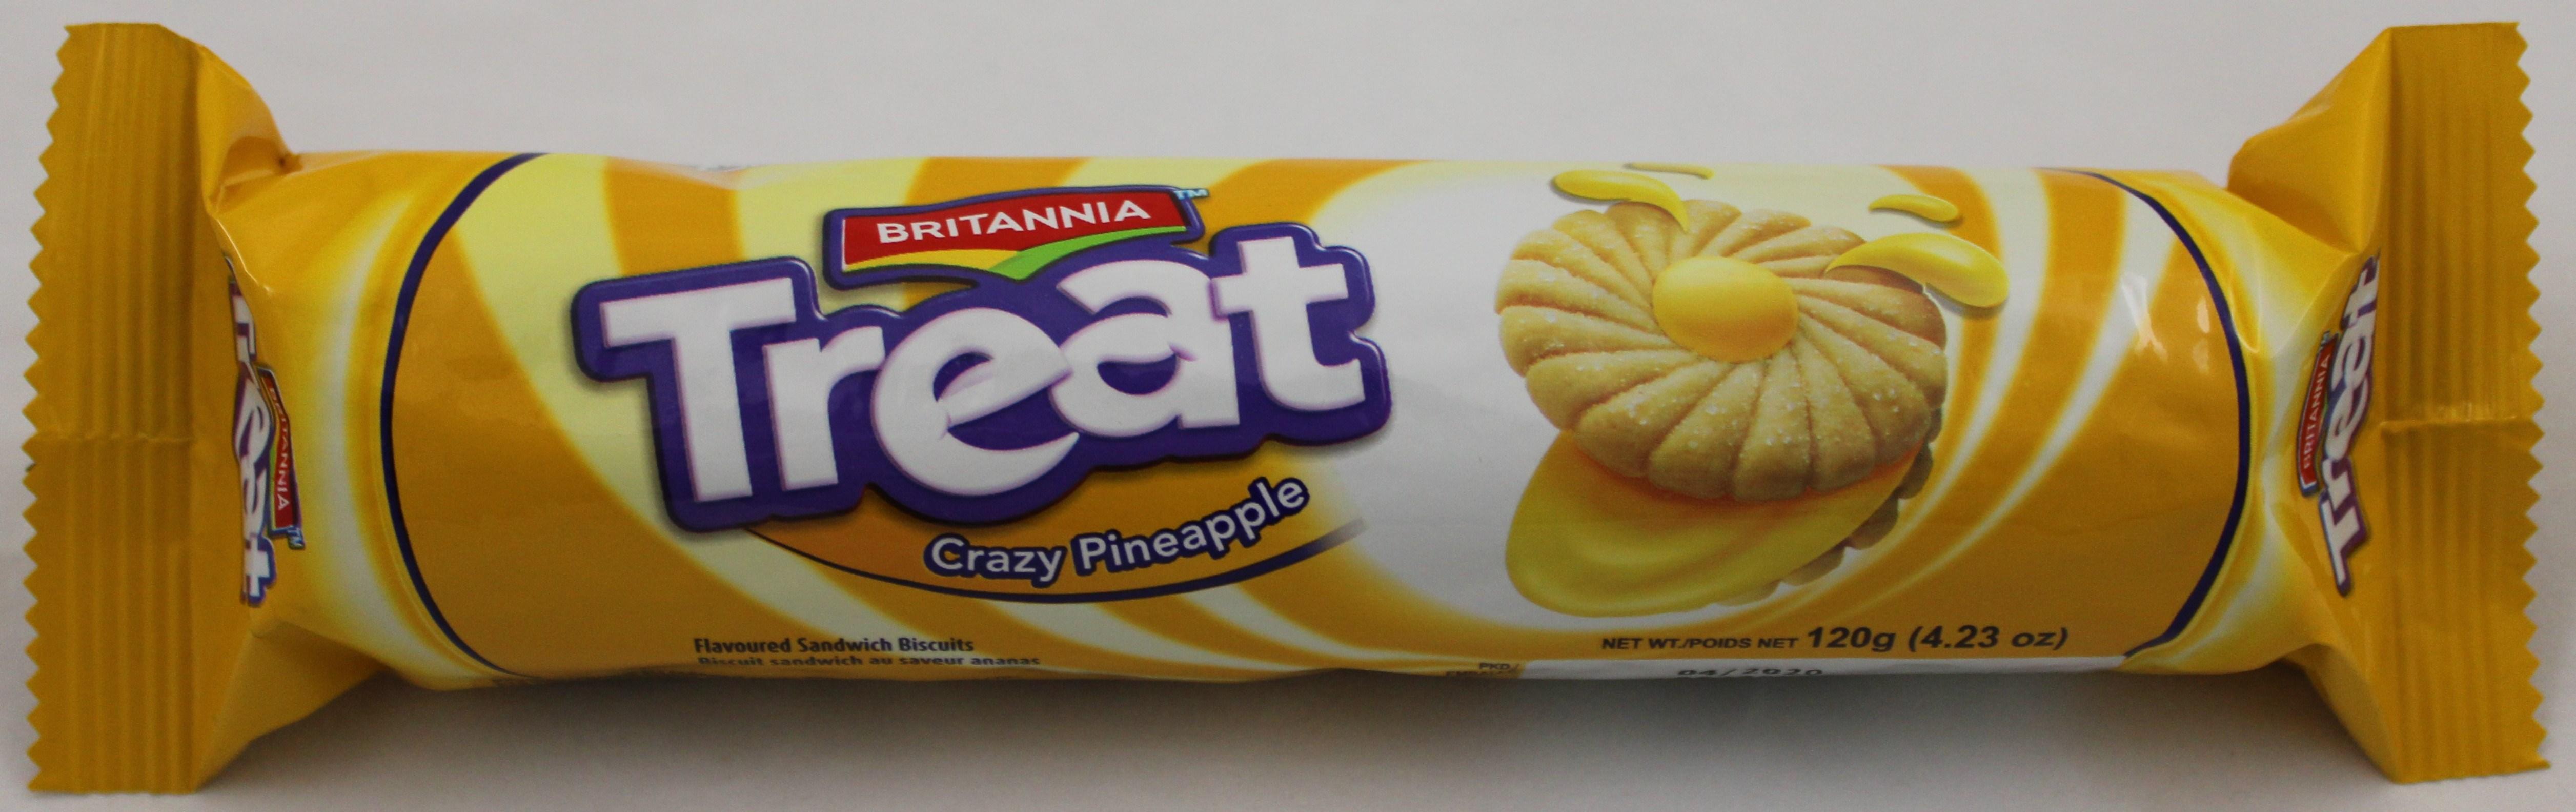 Treat Pineapple 4.23Oz